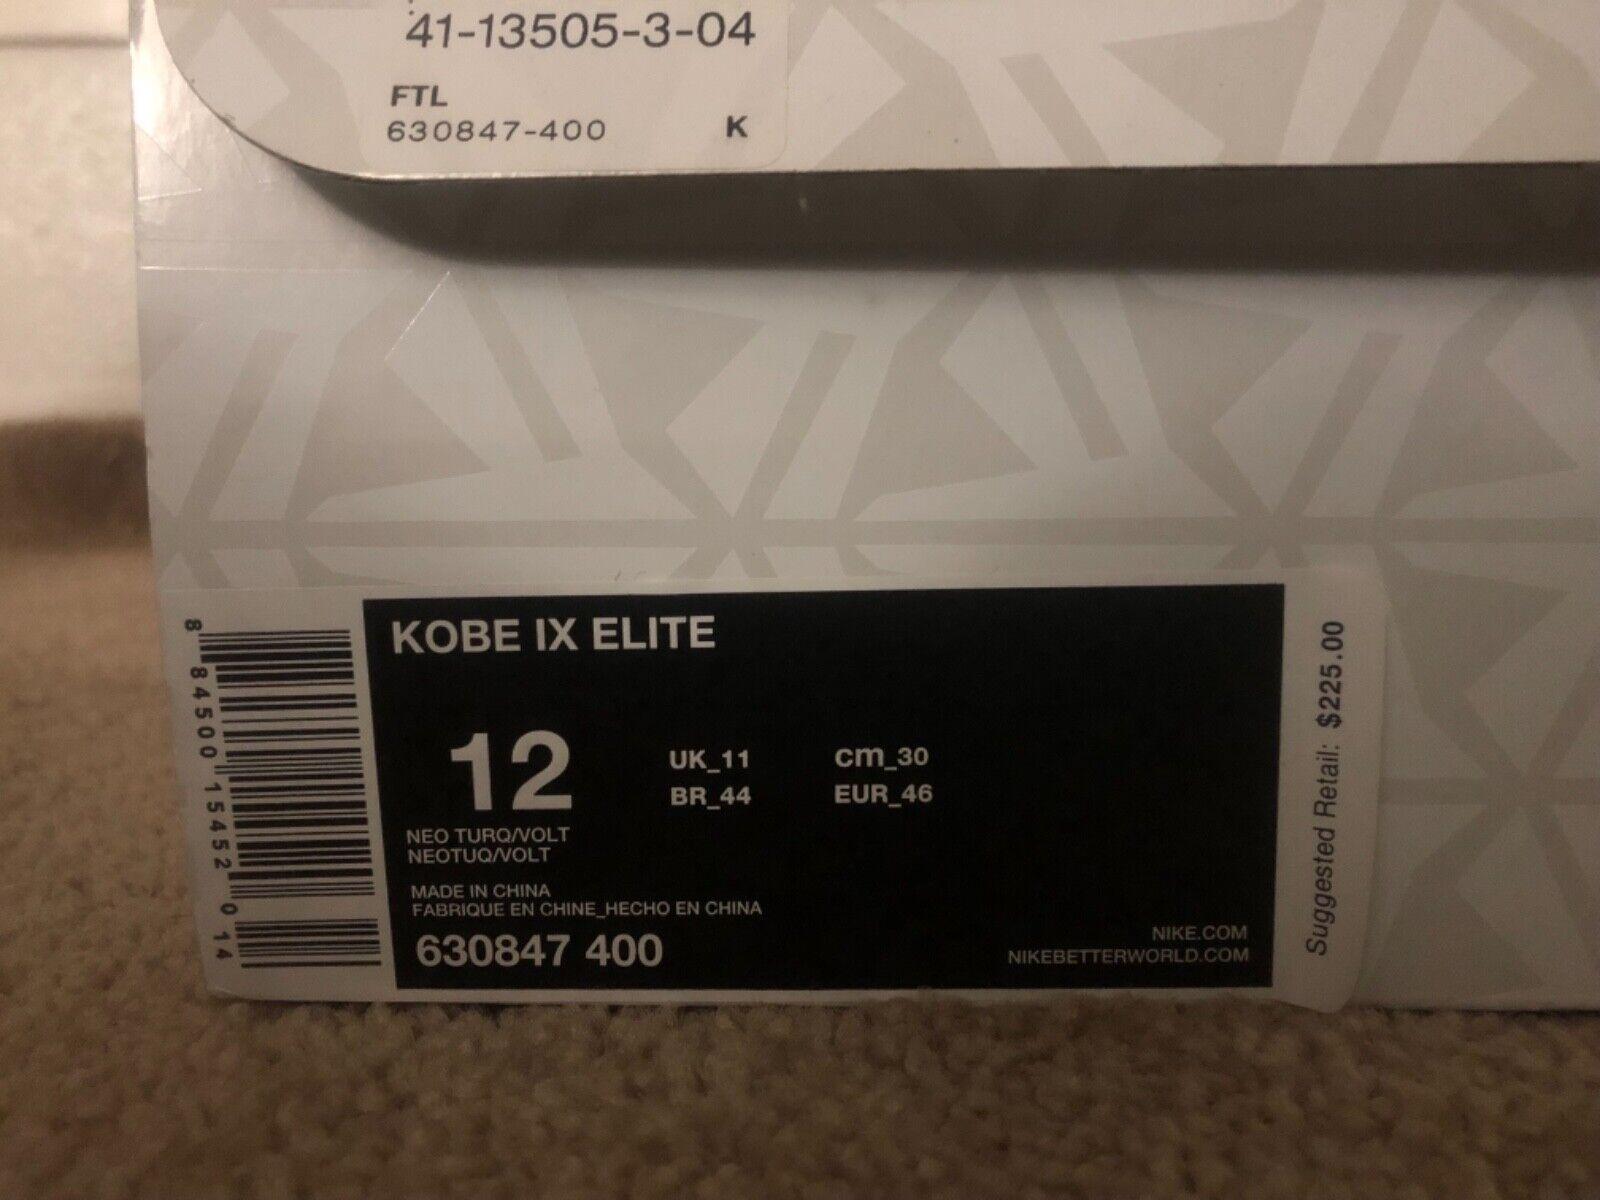 Mens basketball shoes size 12 kobe 9 elite perspective